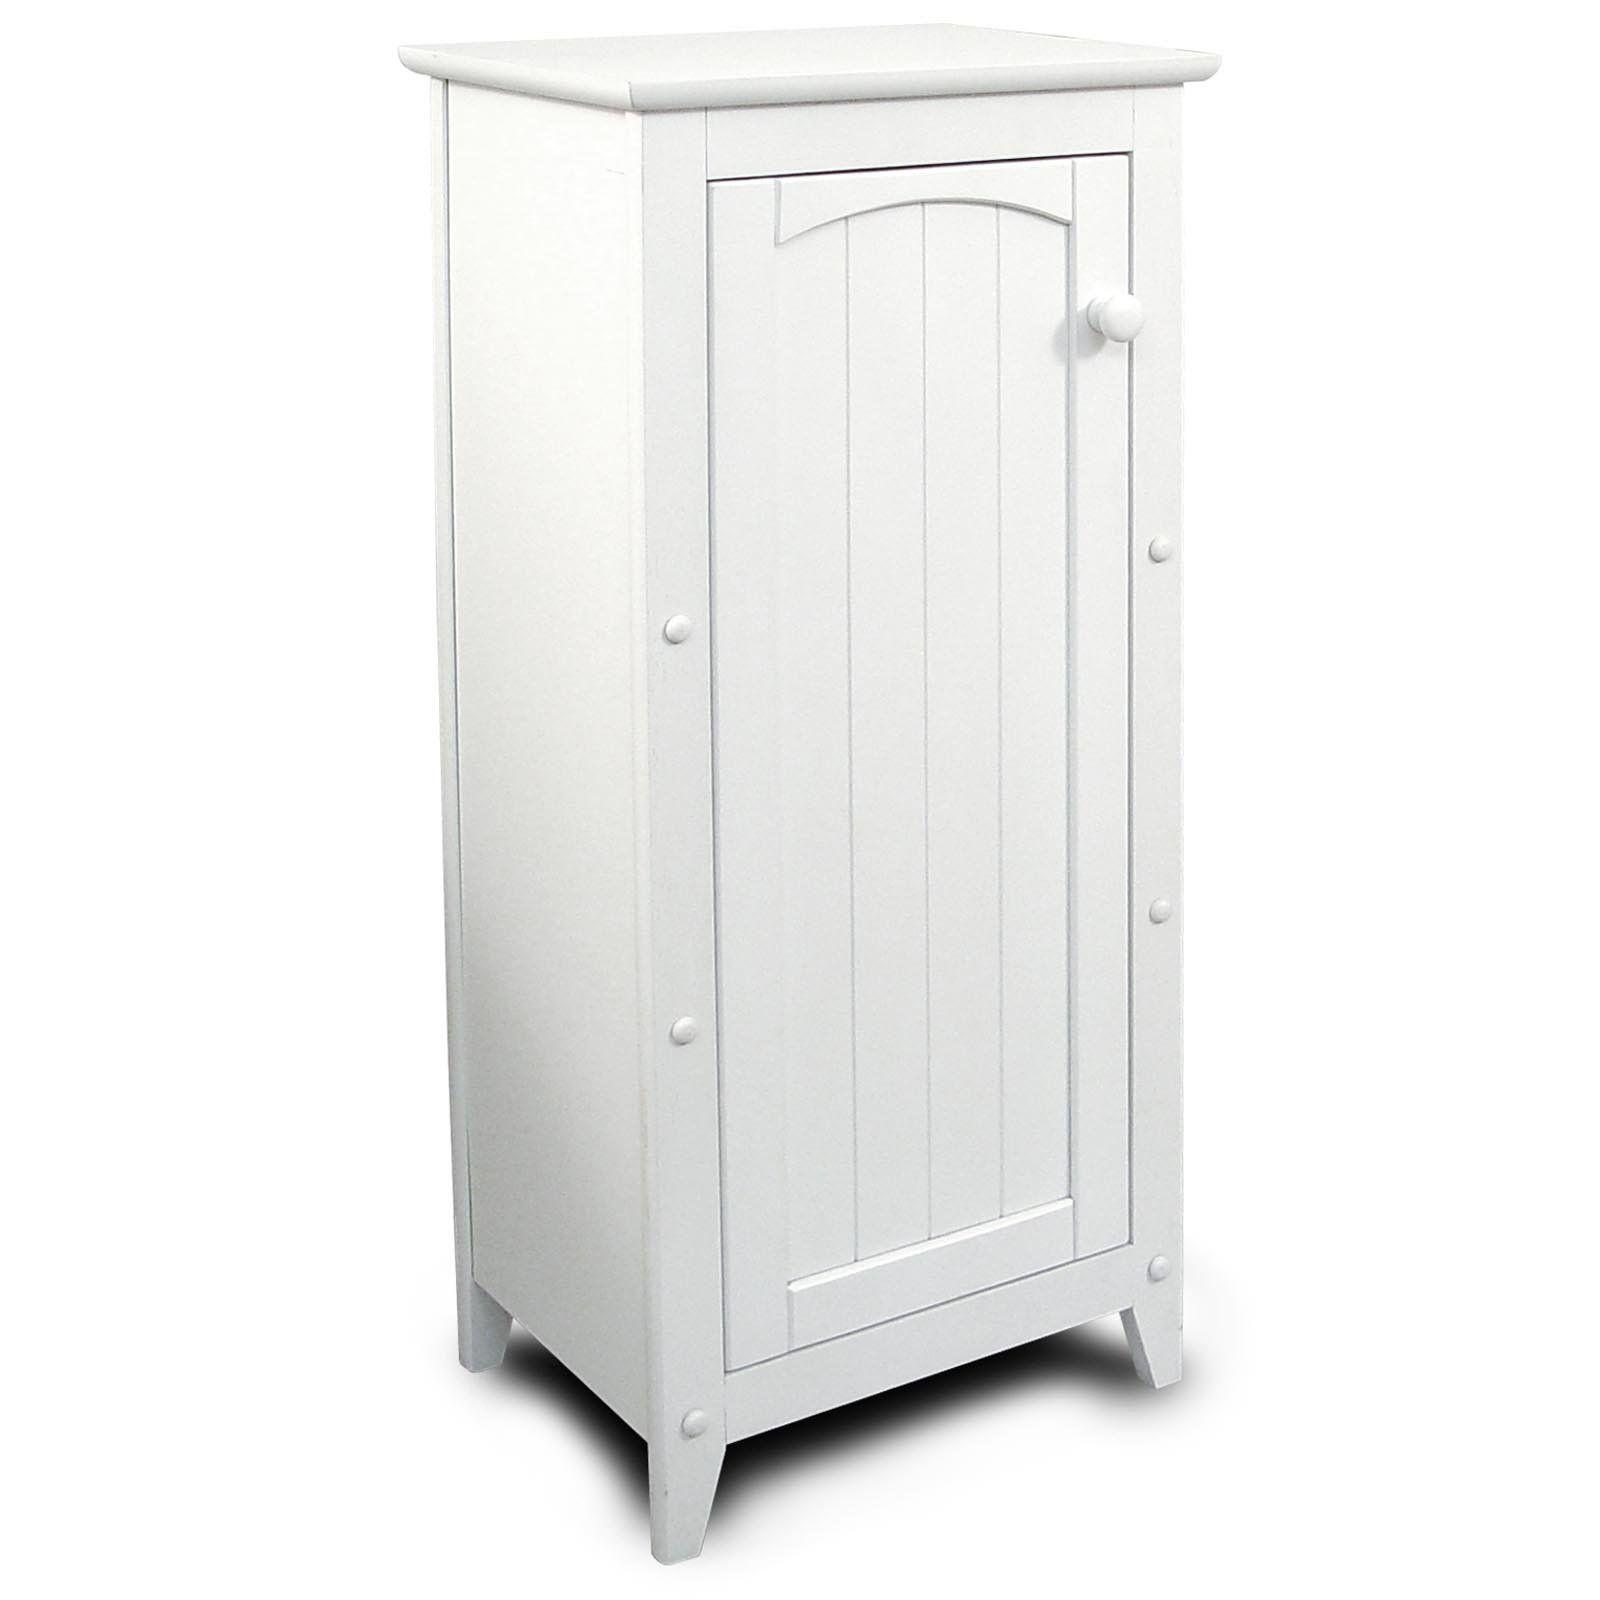 Tall Kitchen Utility Cabinets Kitchen Utility Cabinet Storage